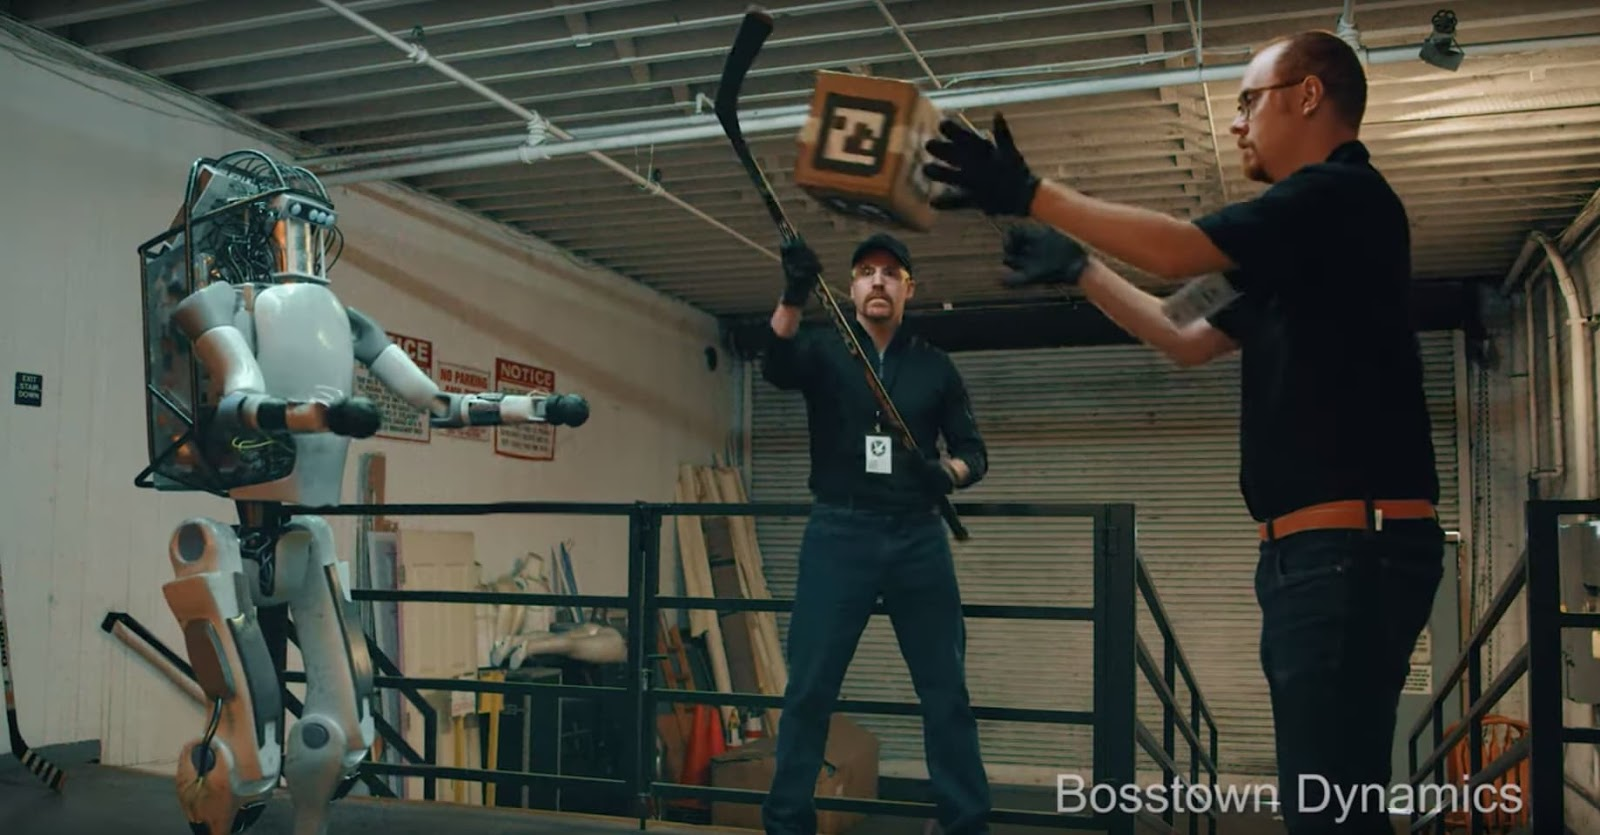 Boston Dynamics, Corridor, Prank, Fake Video, Bosstown Dynamics, Roboter, Virales